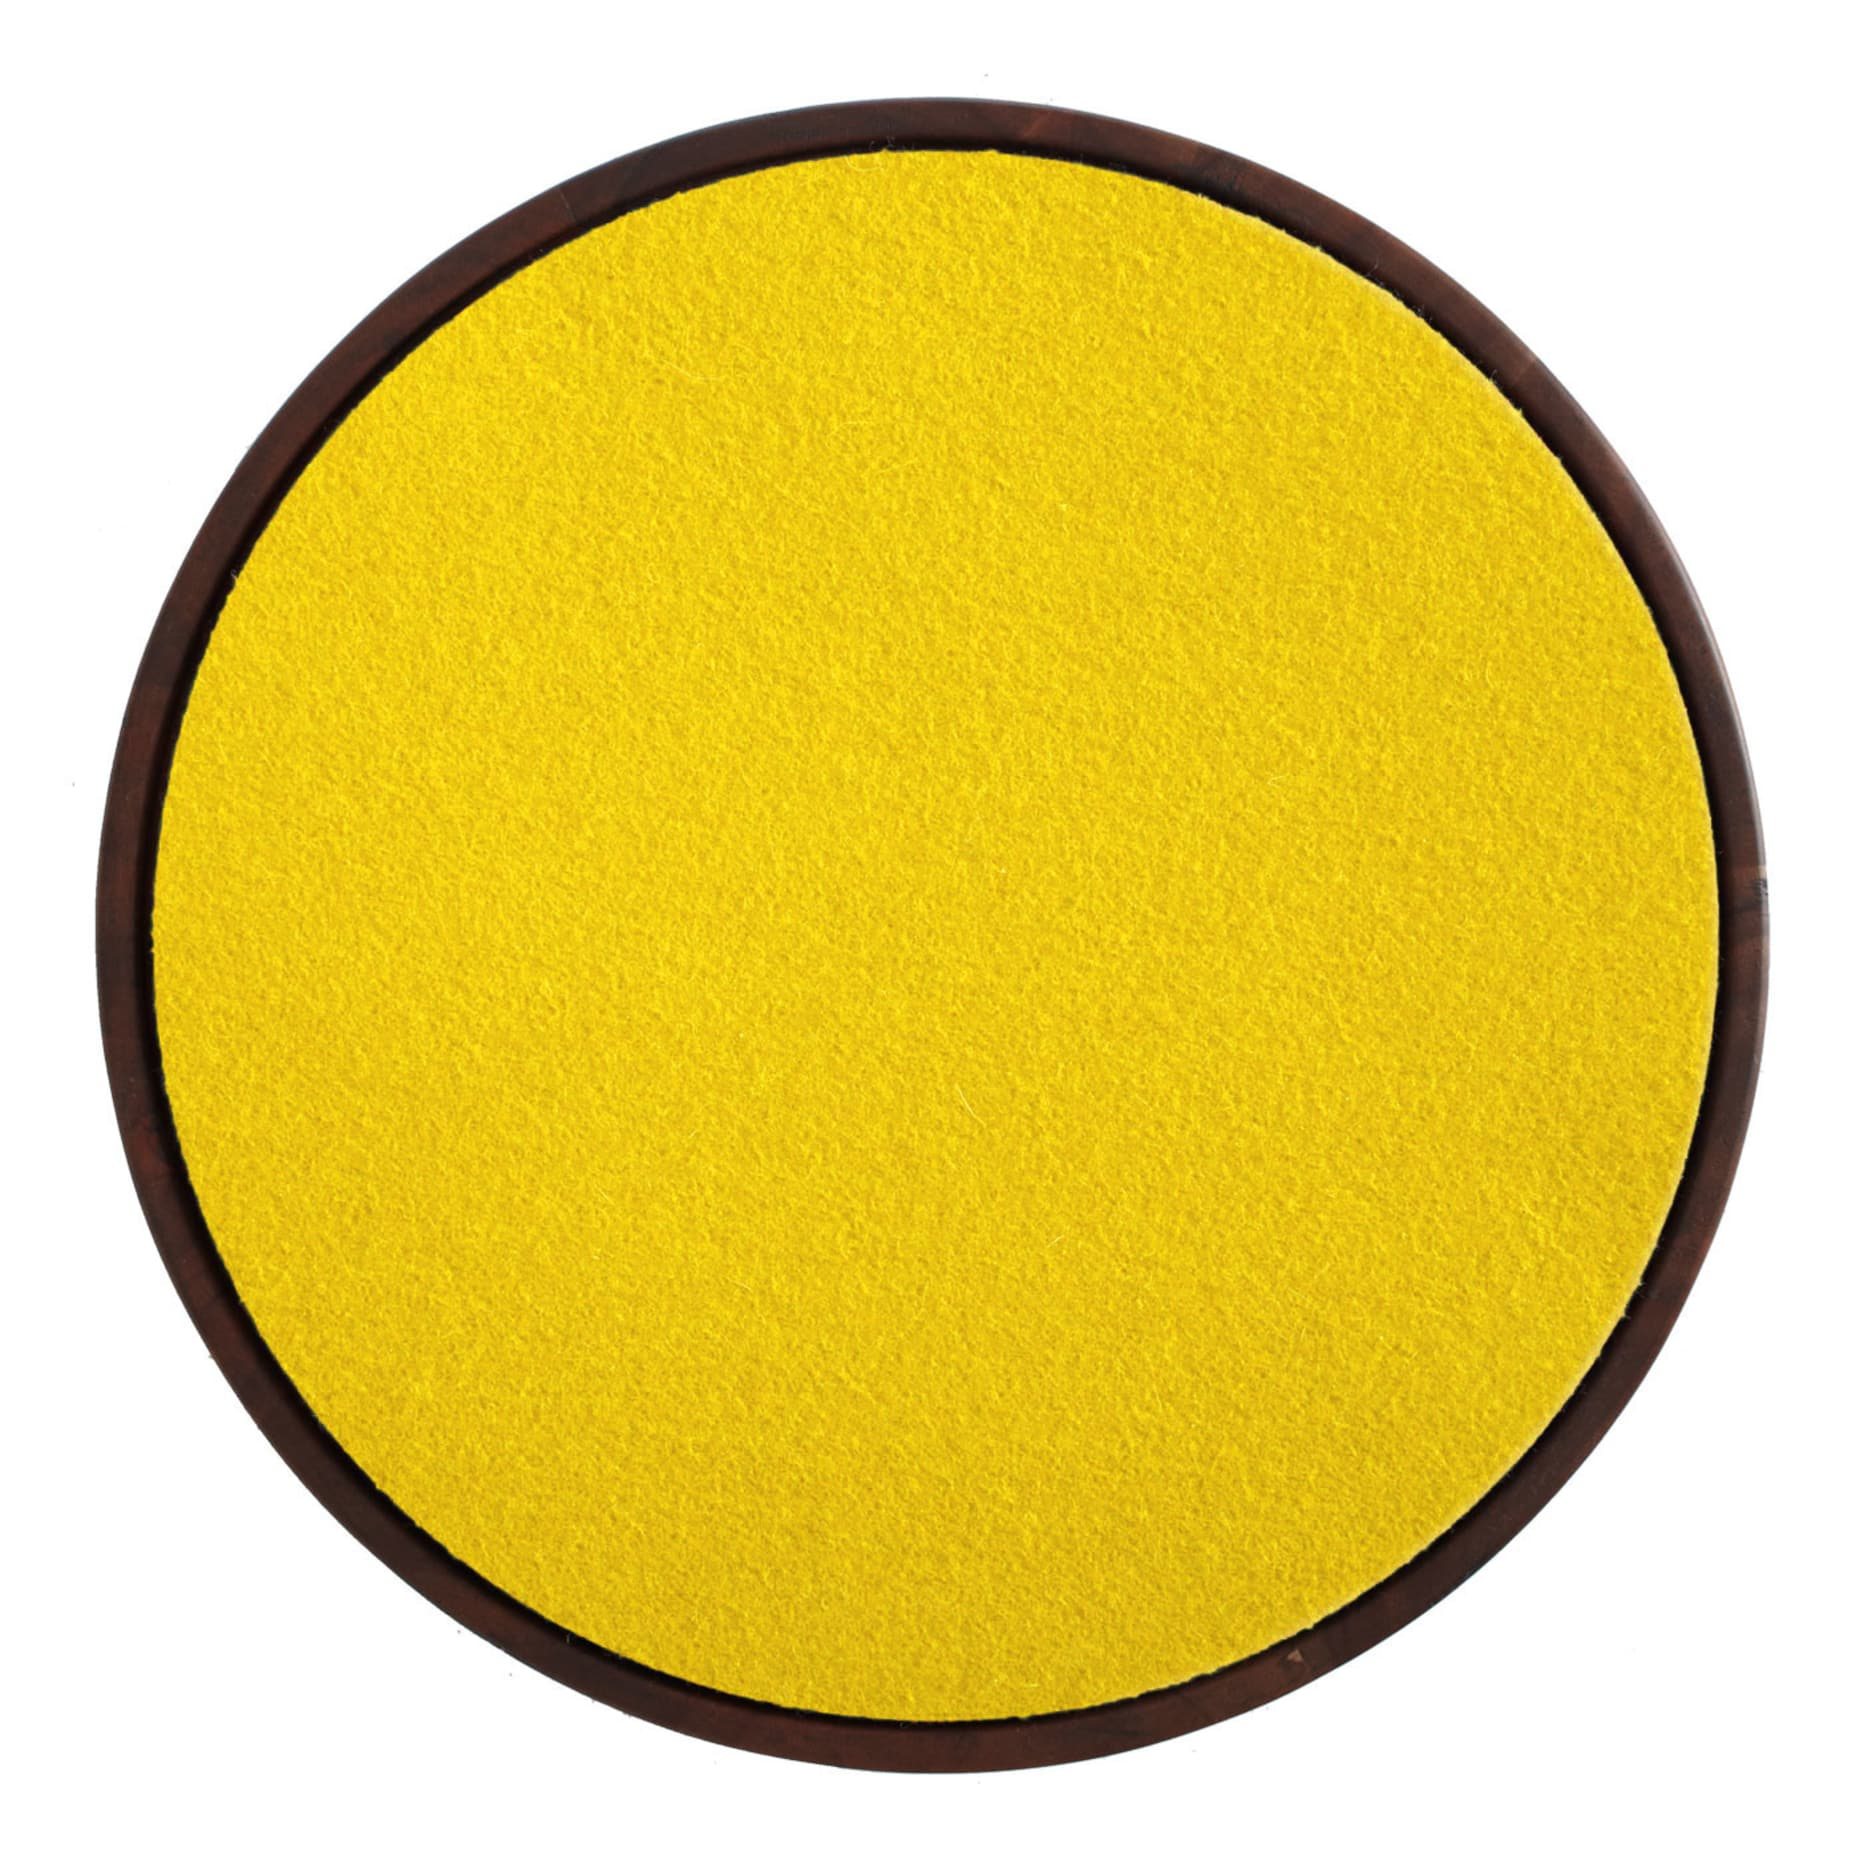 tn1 stlflt yl turn stool felt pad yellow 3